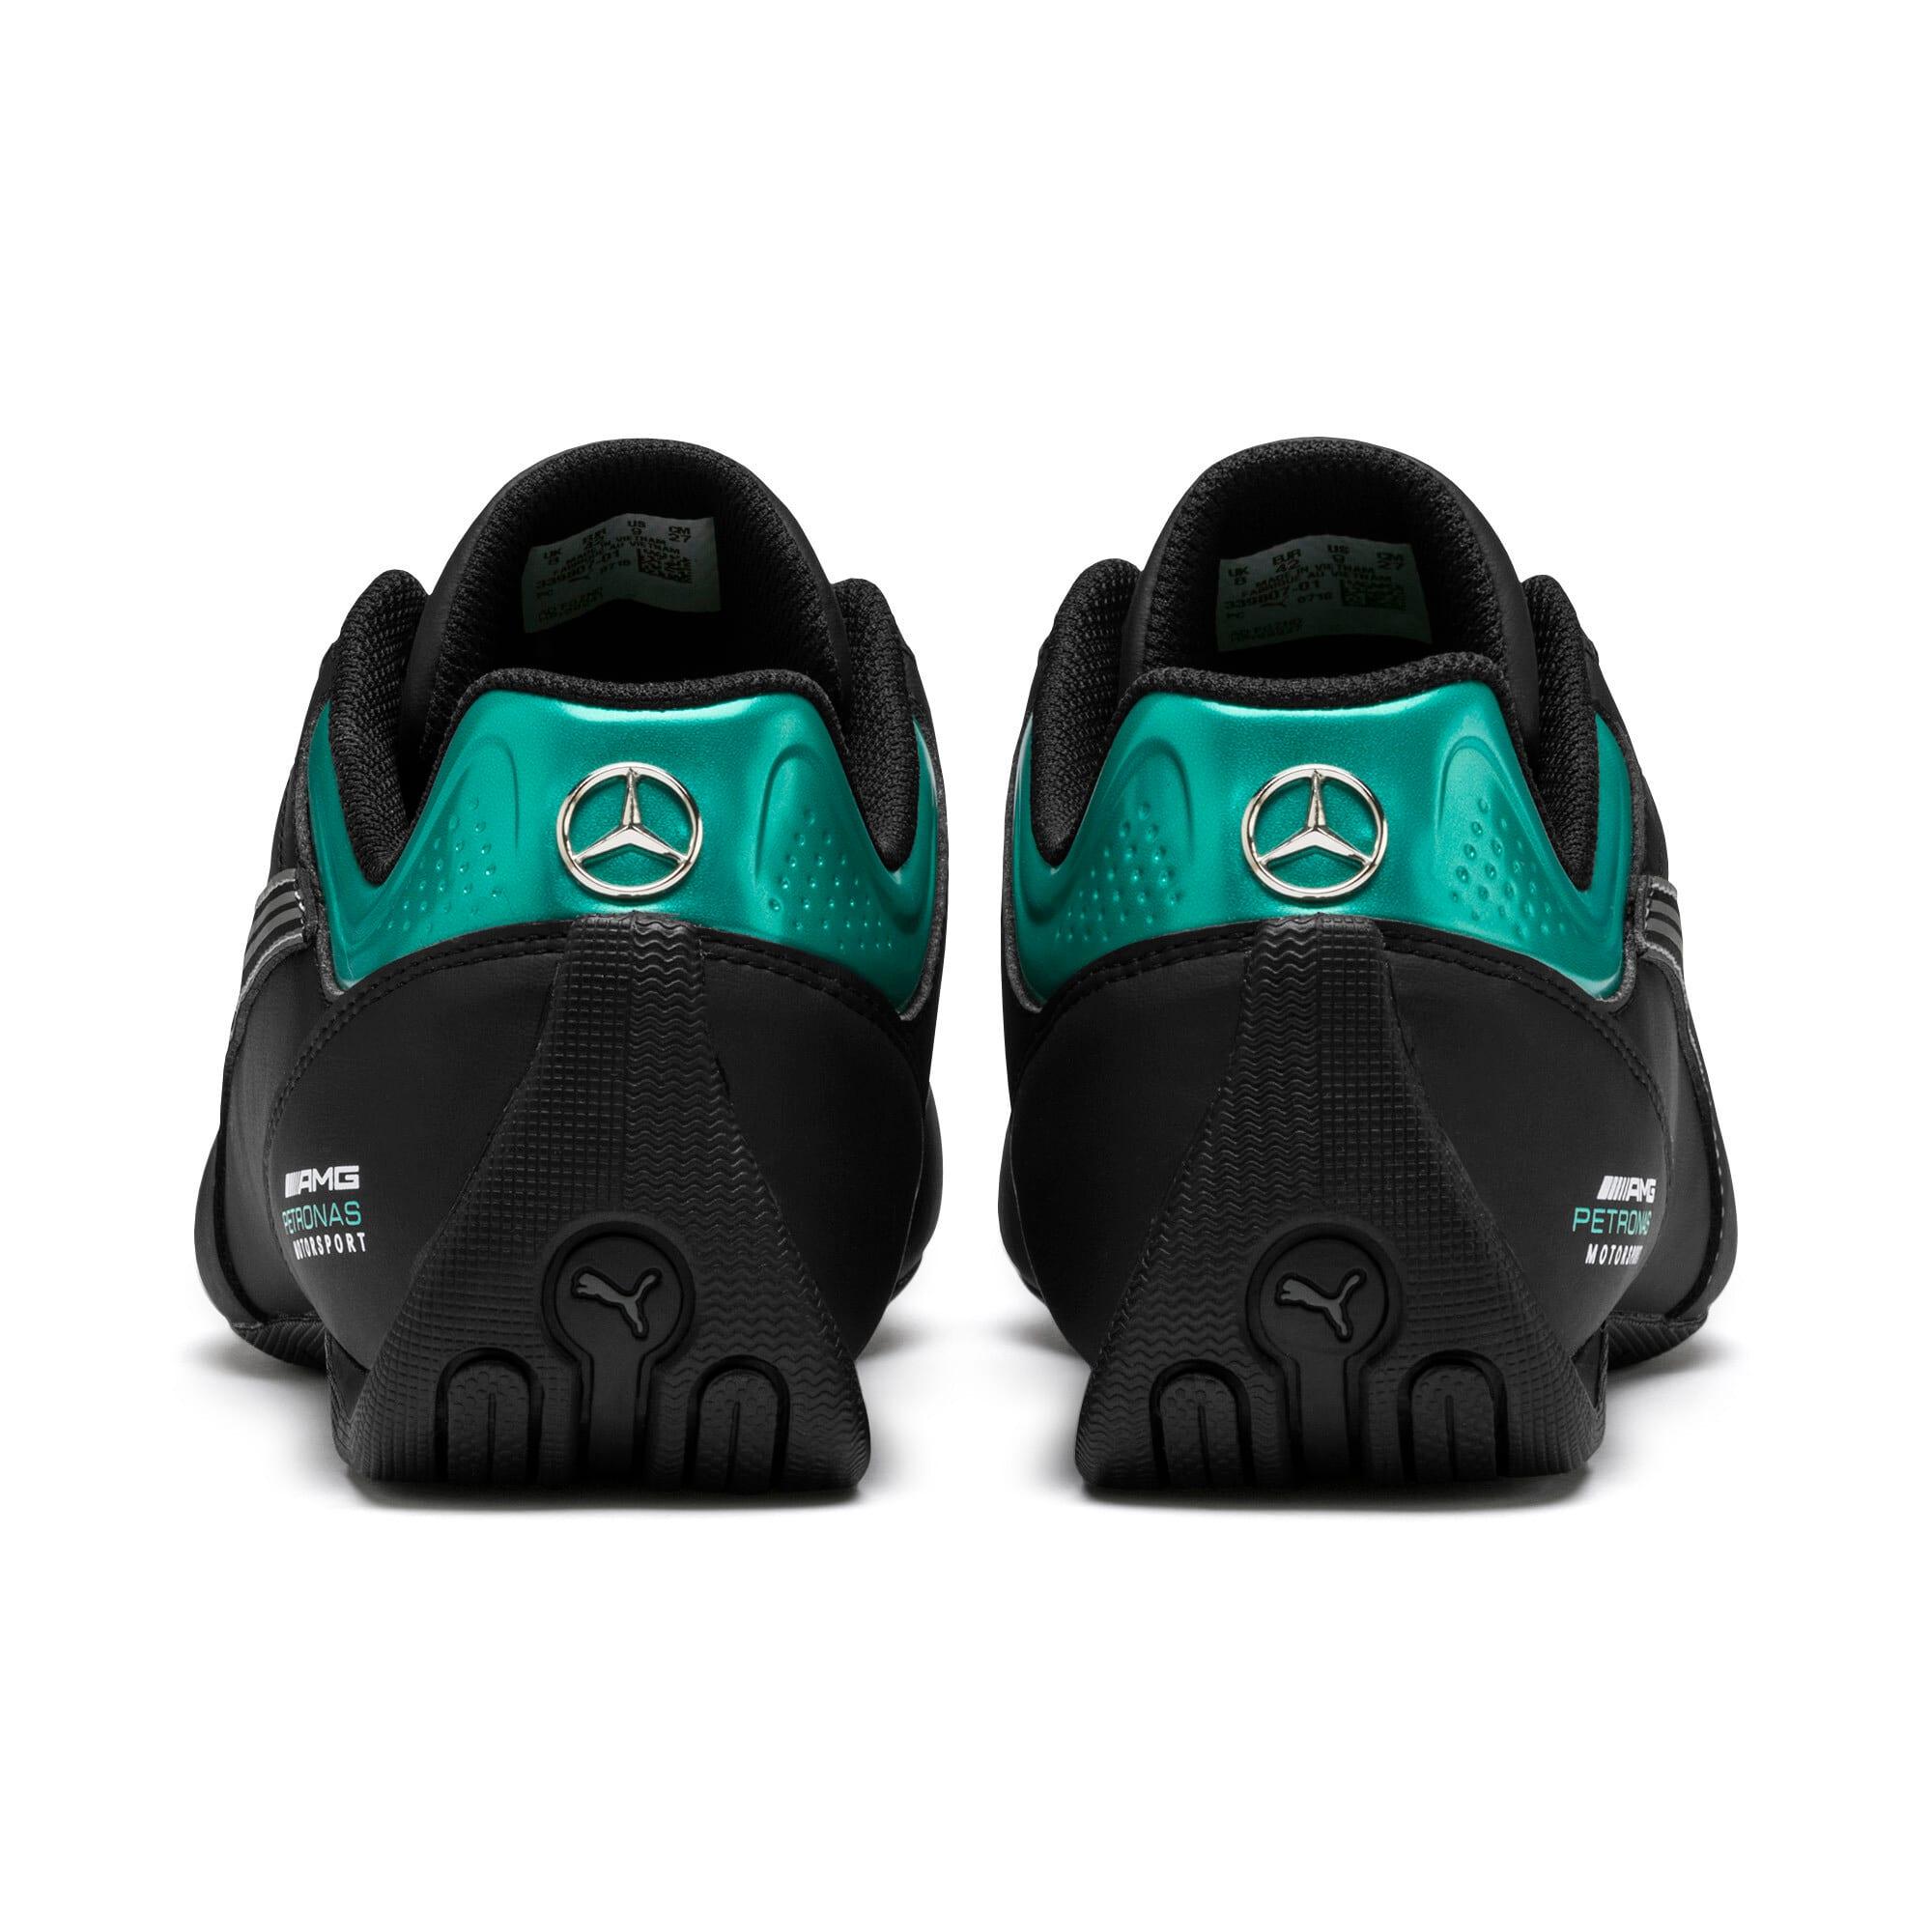 Thumbnail 4 of Mercedes AMG Petronas Future Kart Cat Shoes, Puma Black-Smoked Pearl, medium